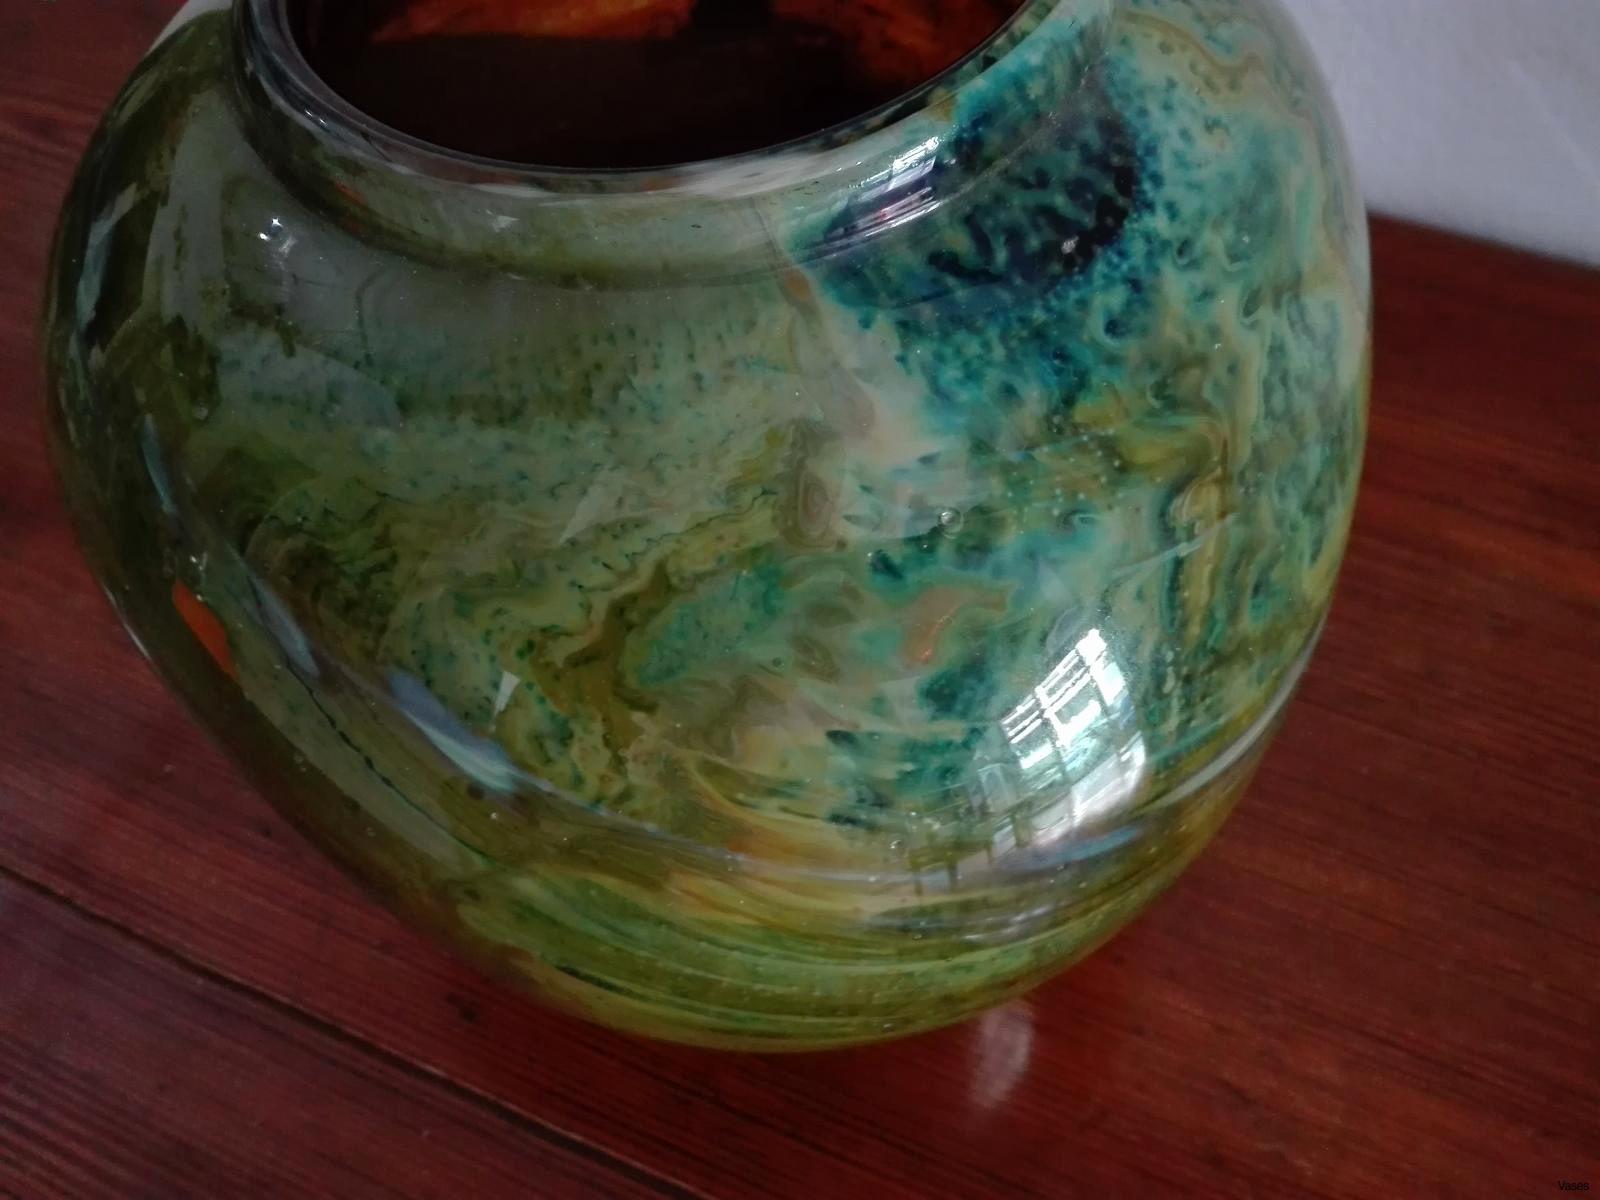 green blown glass vase of 18 best of murano glass vase bogekompresorturkiye com regarding murano glas vasen luxus vintage murano glass vases set 2 1h vase price i 0d prices